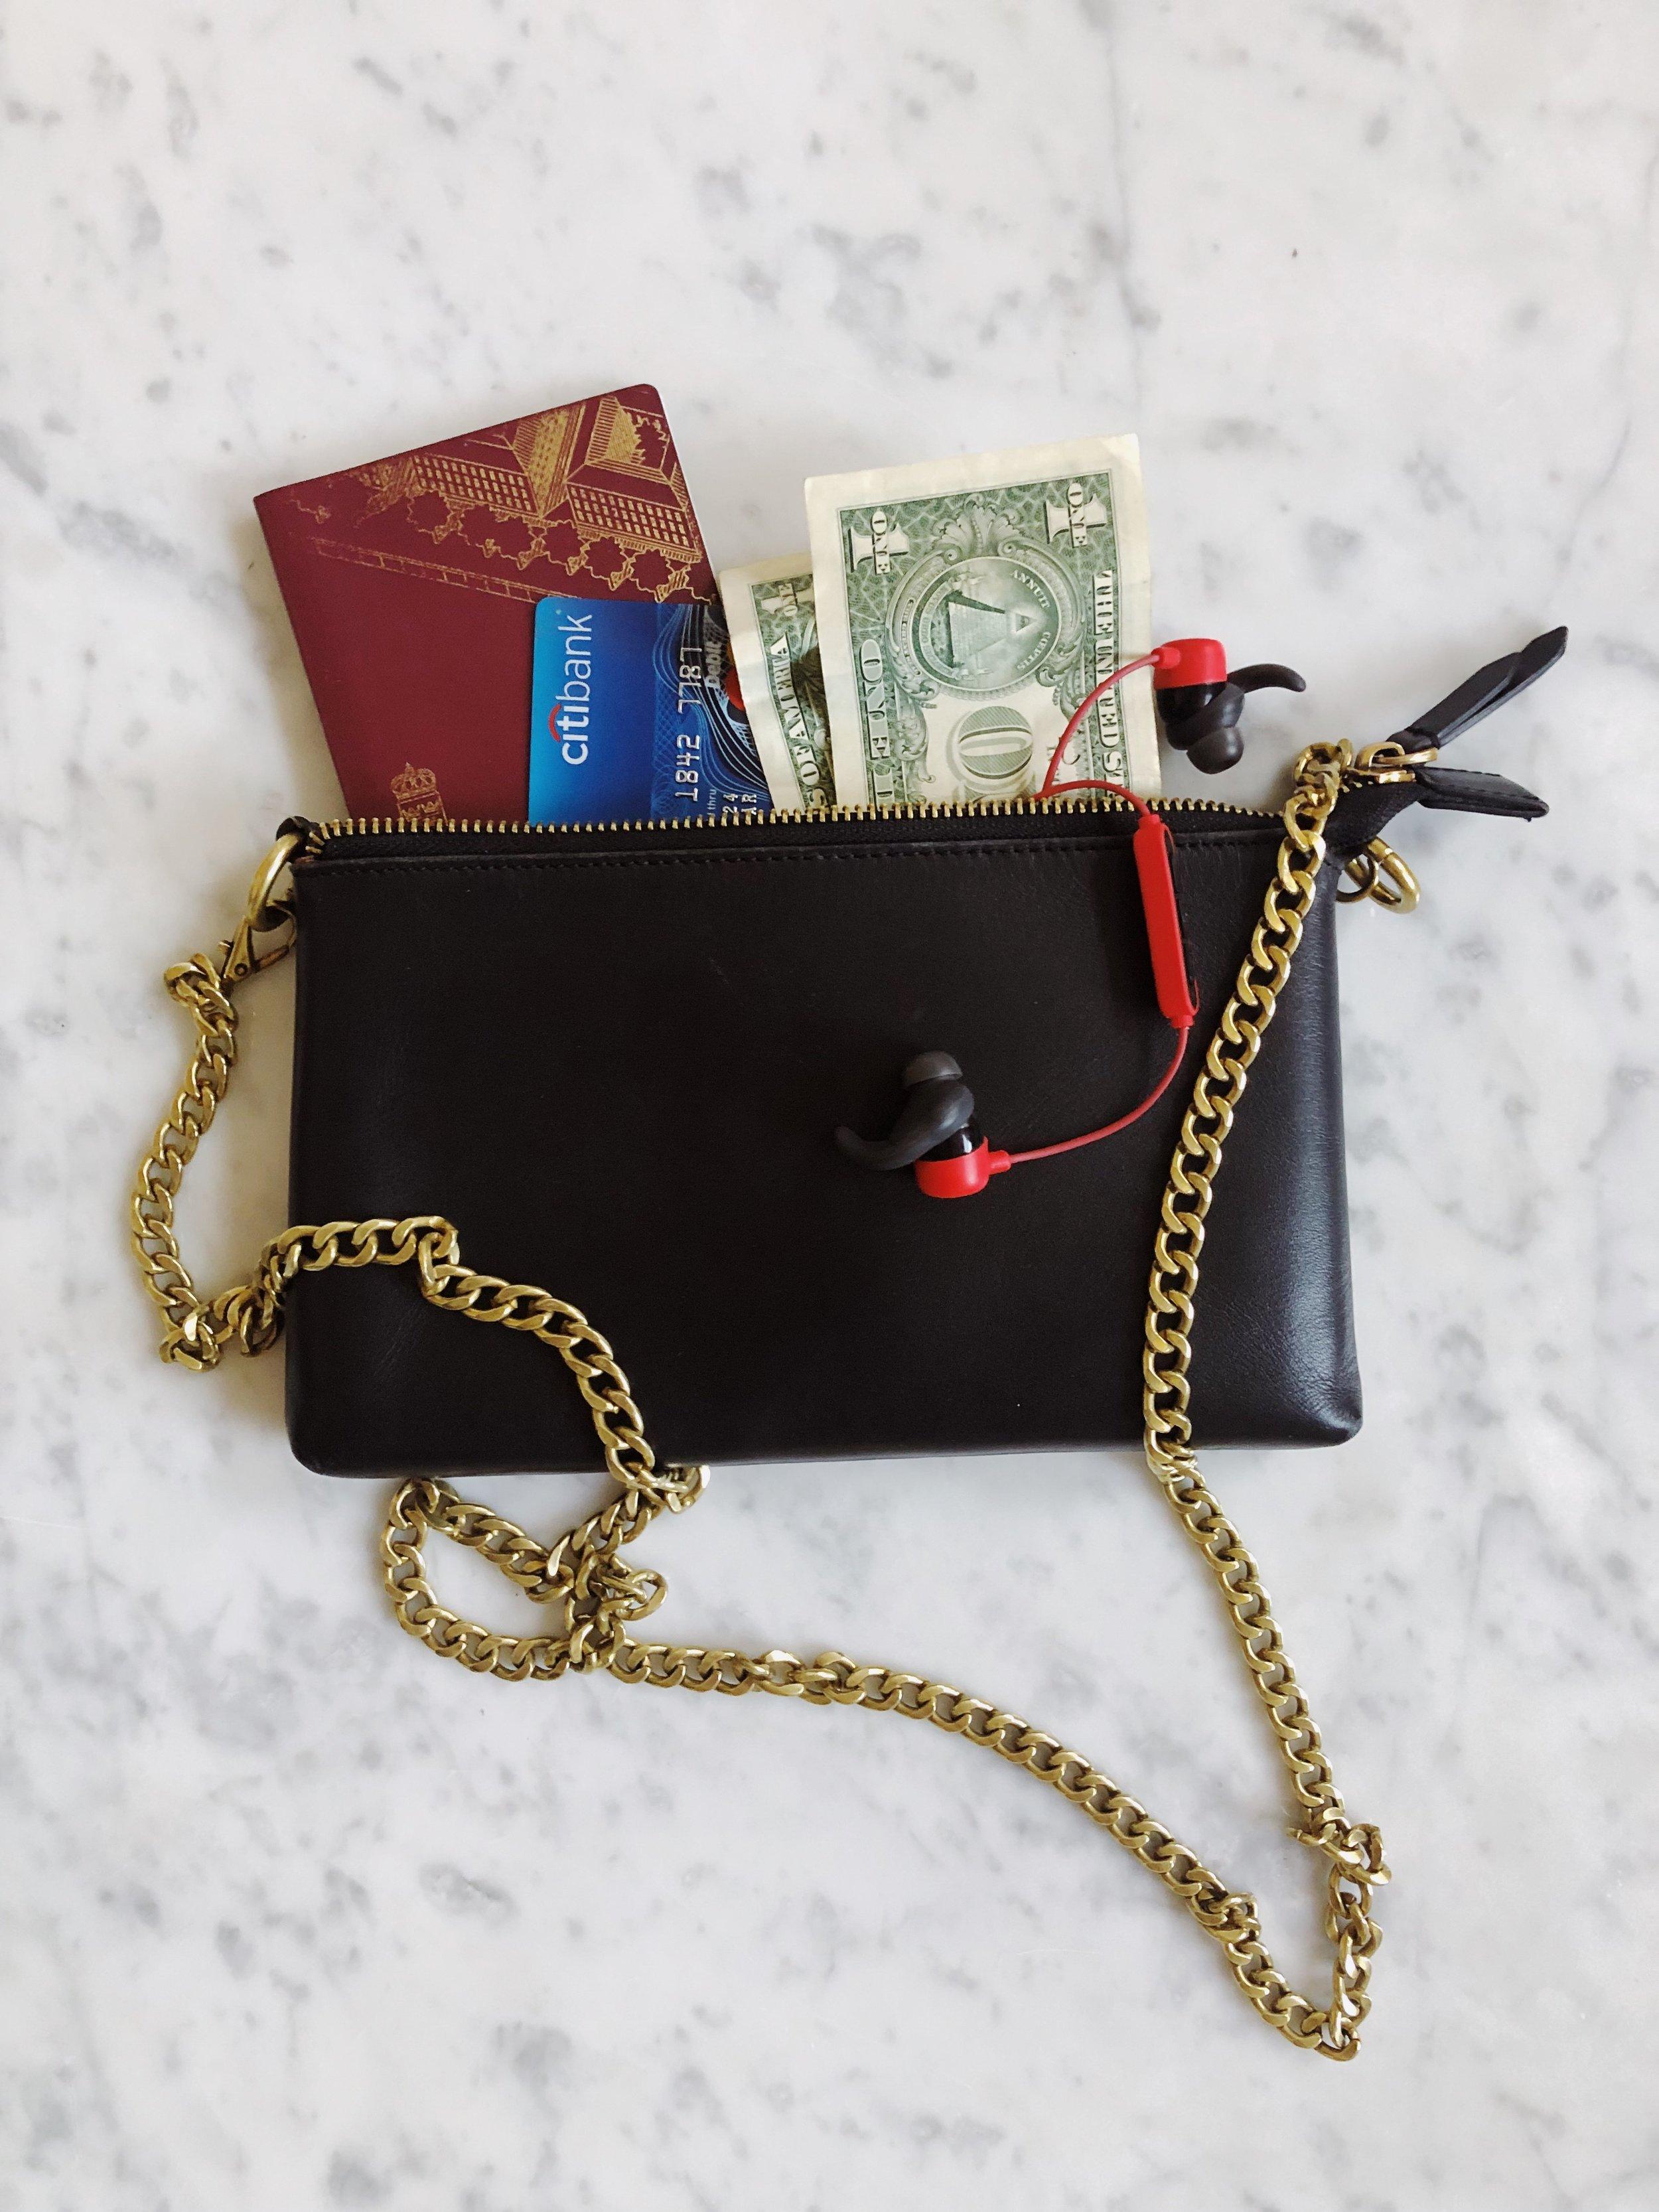 1. Passport  2. Money/Credit cards  3. Earbuds